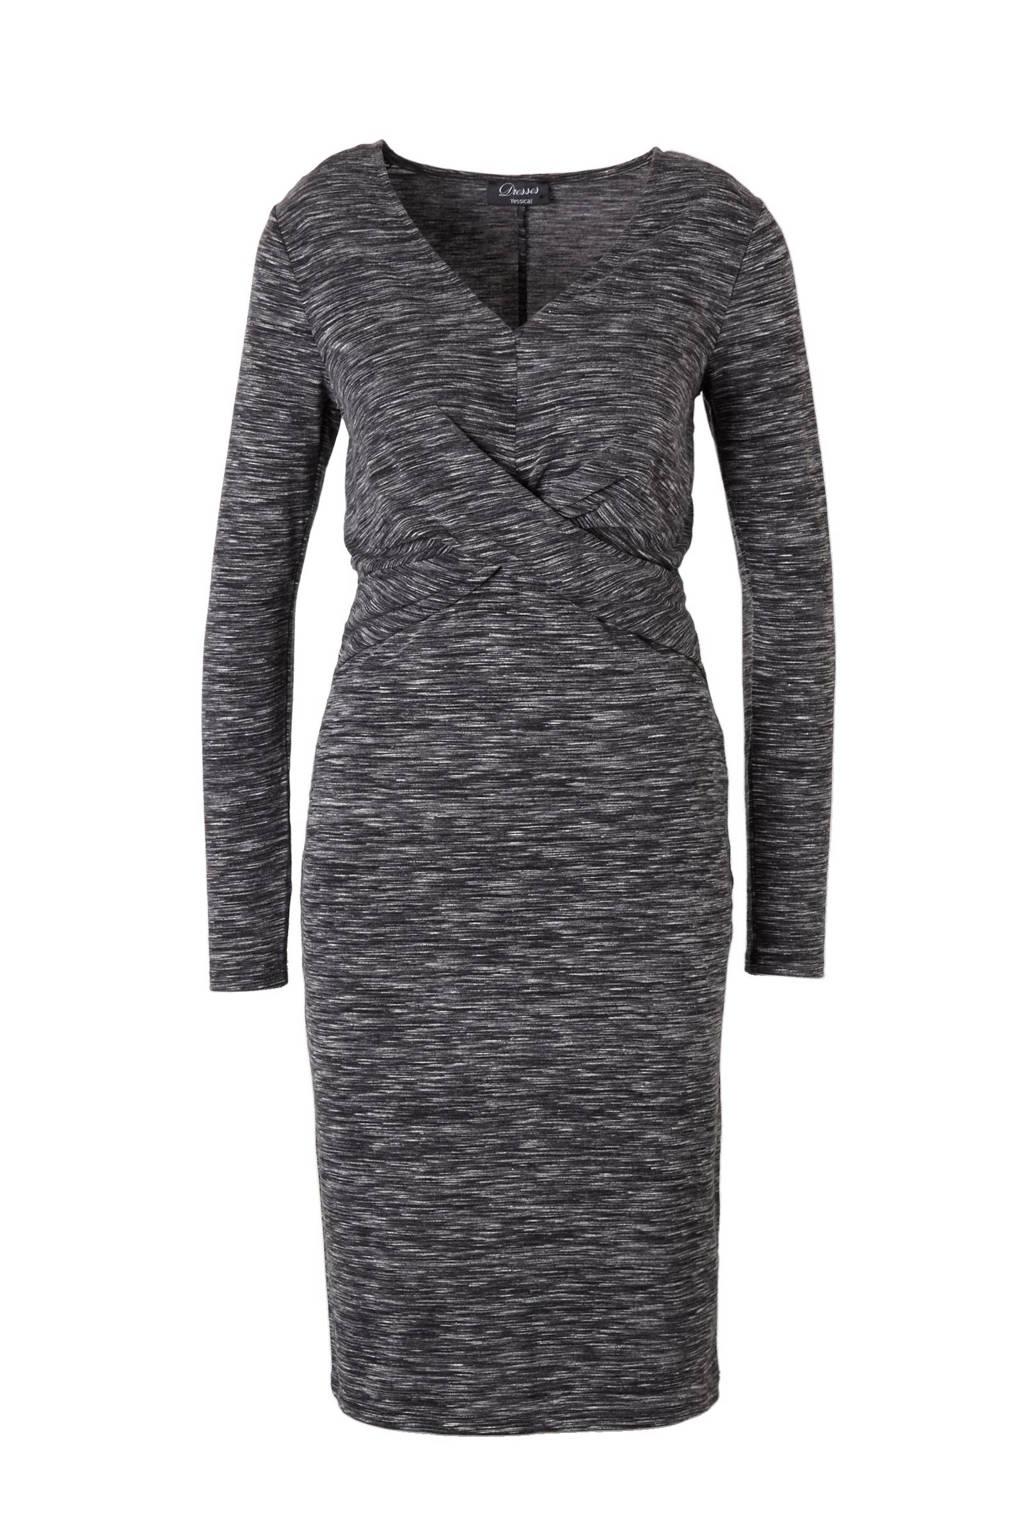 C&A Yessica jurk, Donkergrijs